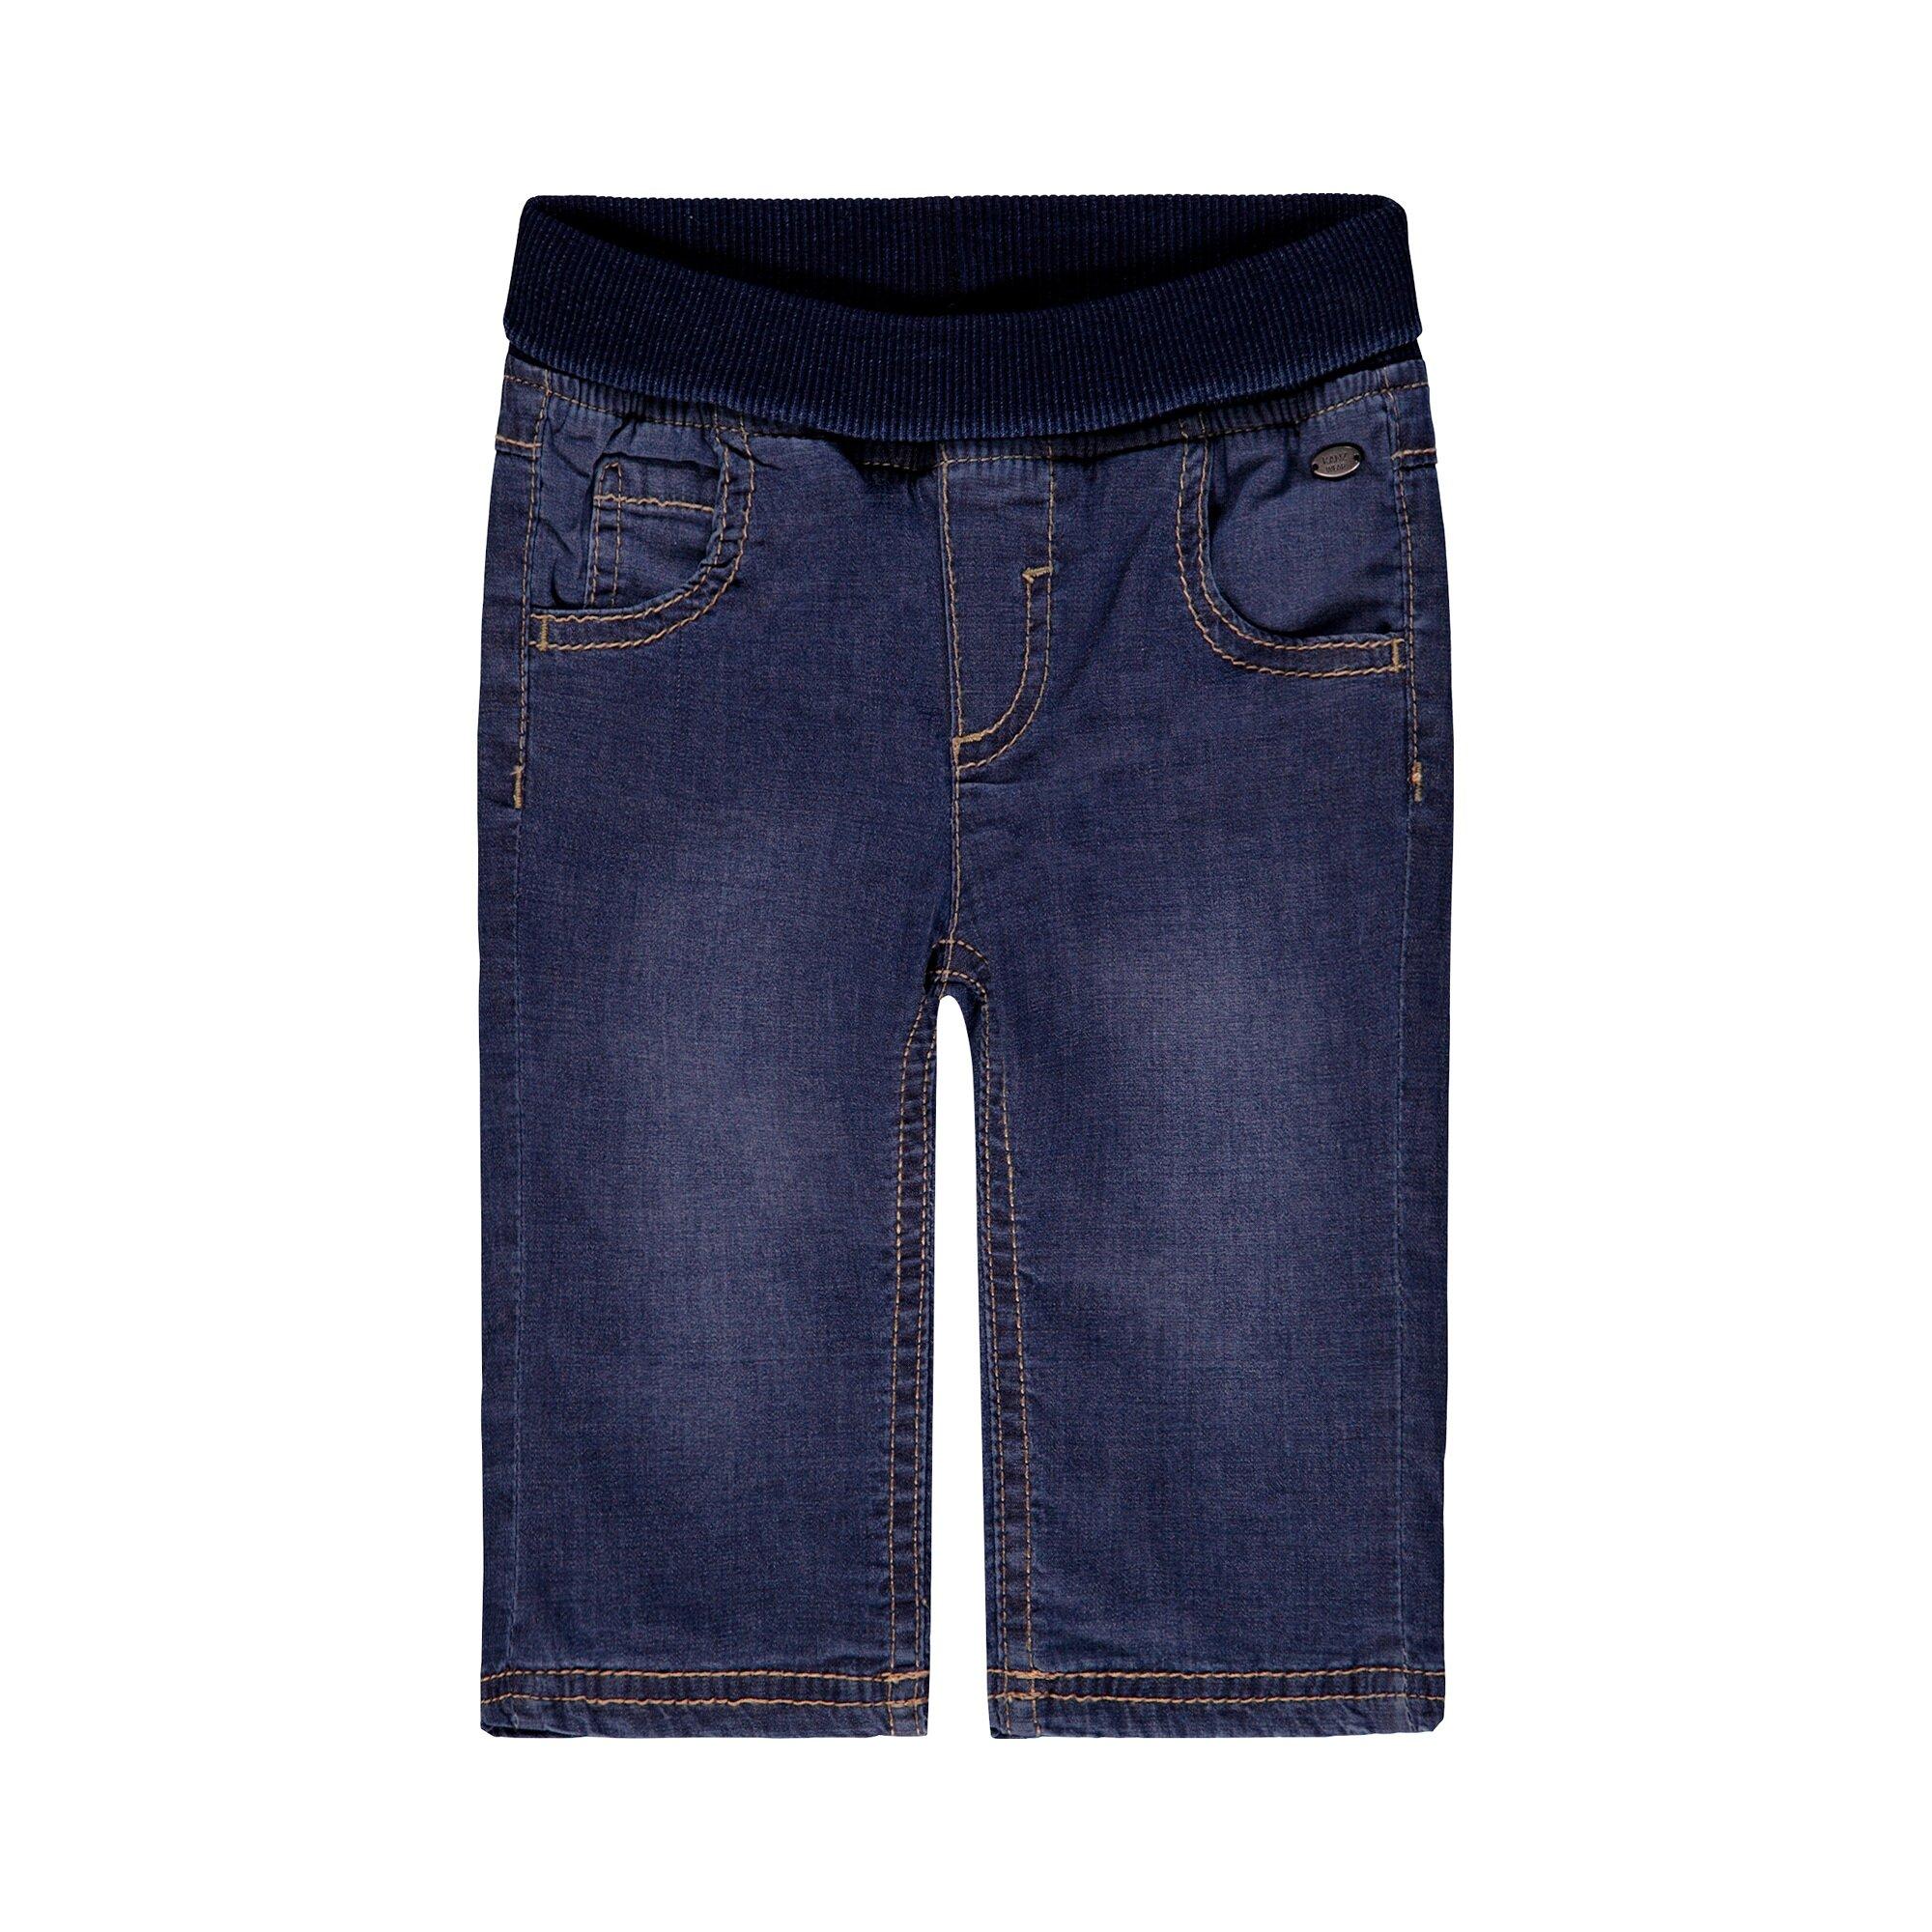 Kanz Jeans 5 Pocket gefüttert